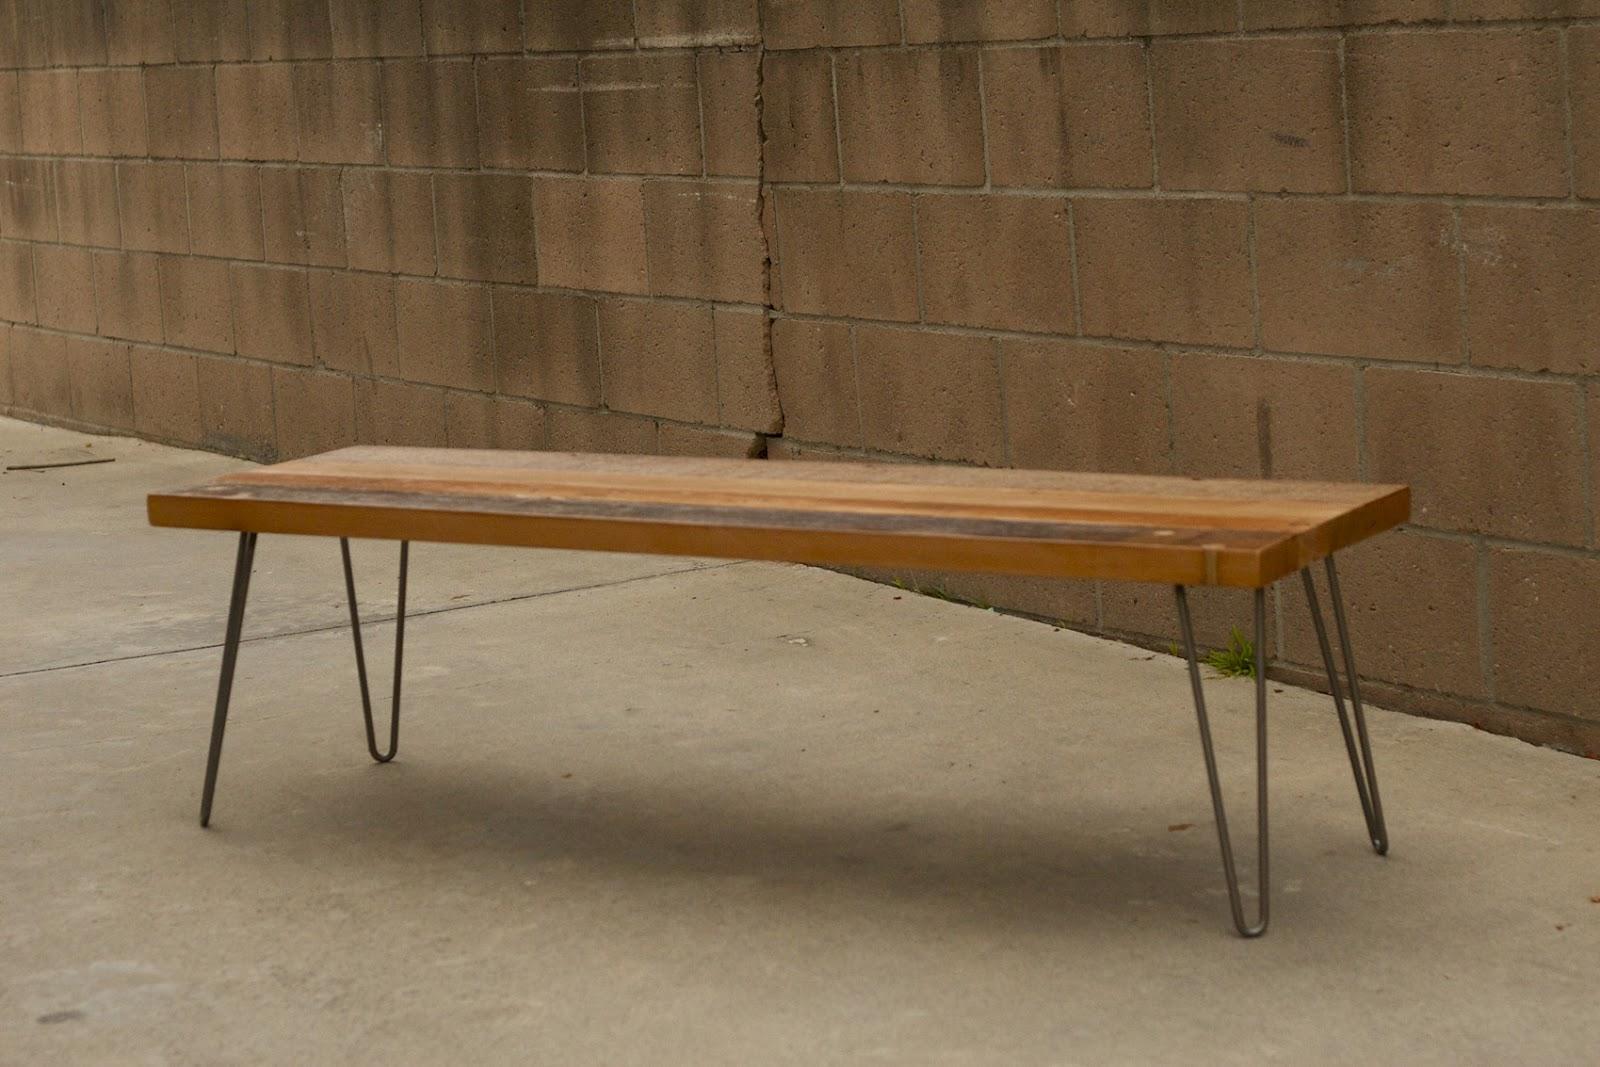 Arbor Exchange | Reclaimed Wood Furniture: Patchwork ...